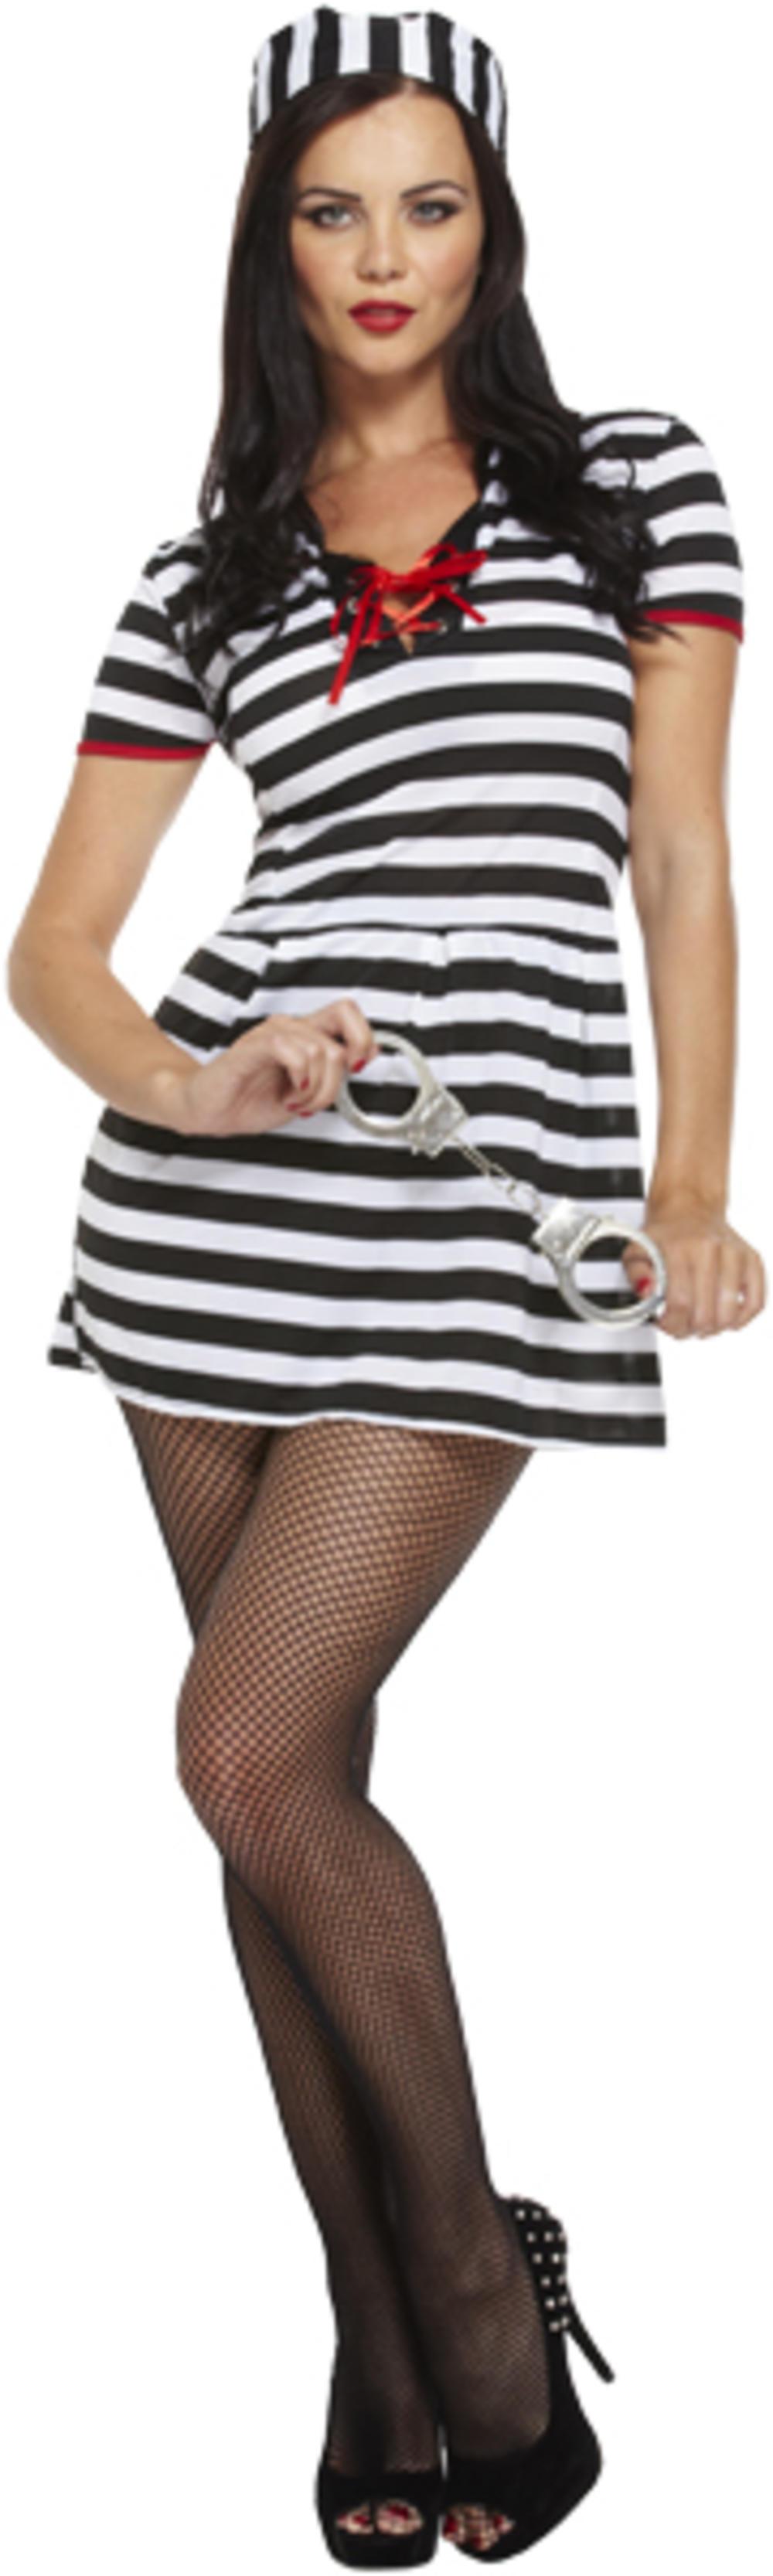 Prisoner Lady Costume